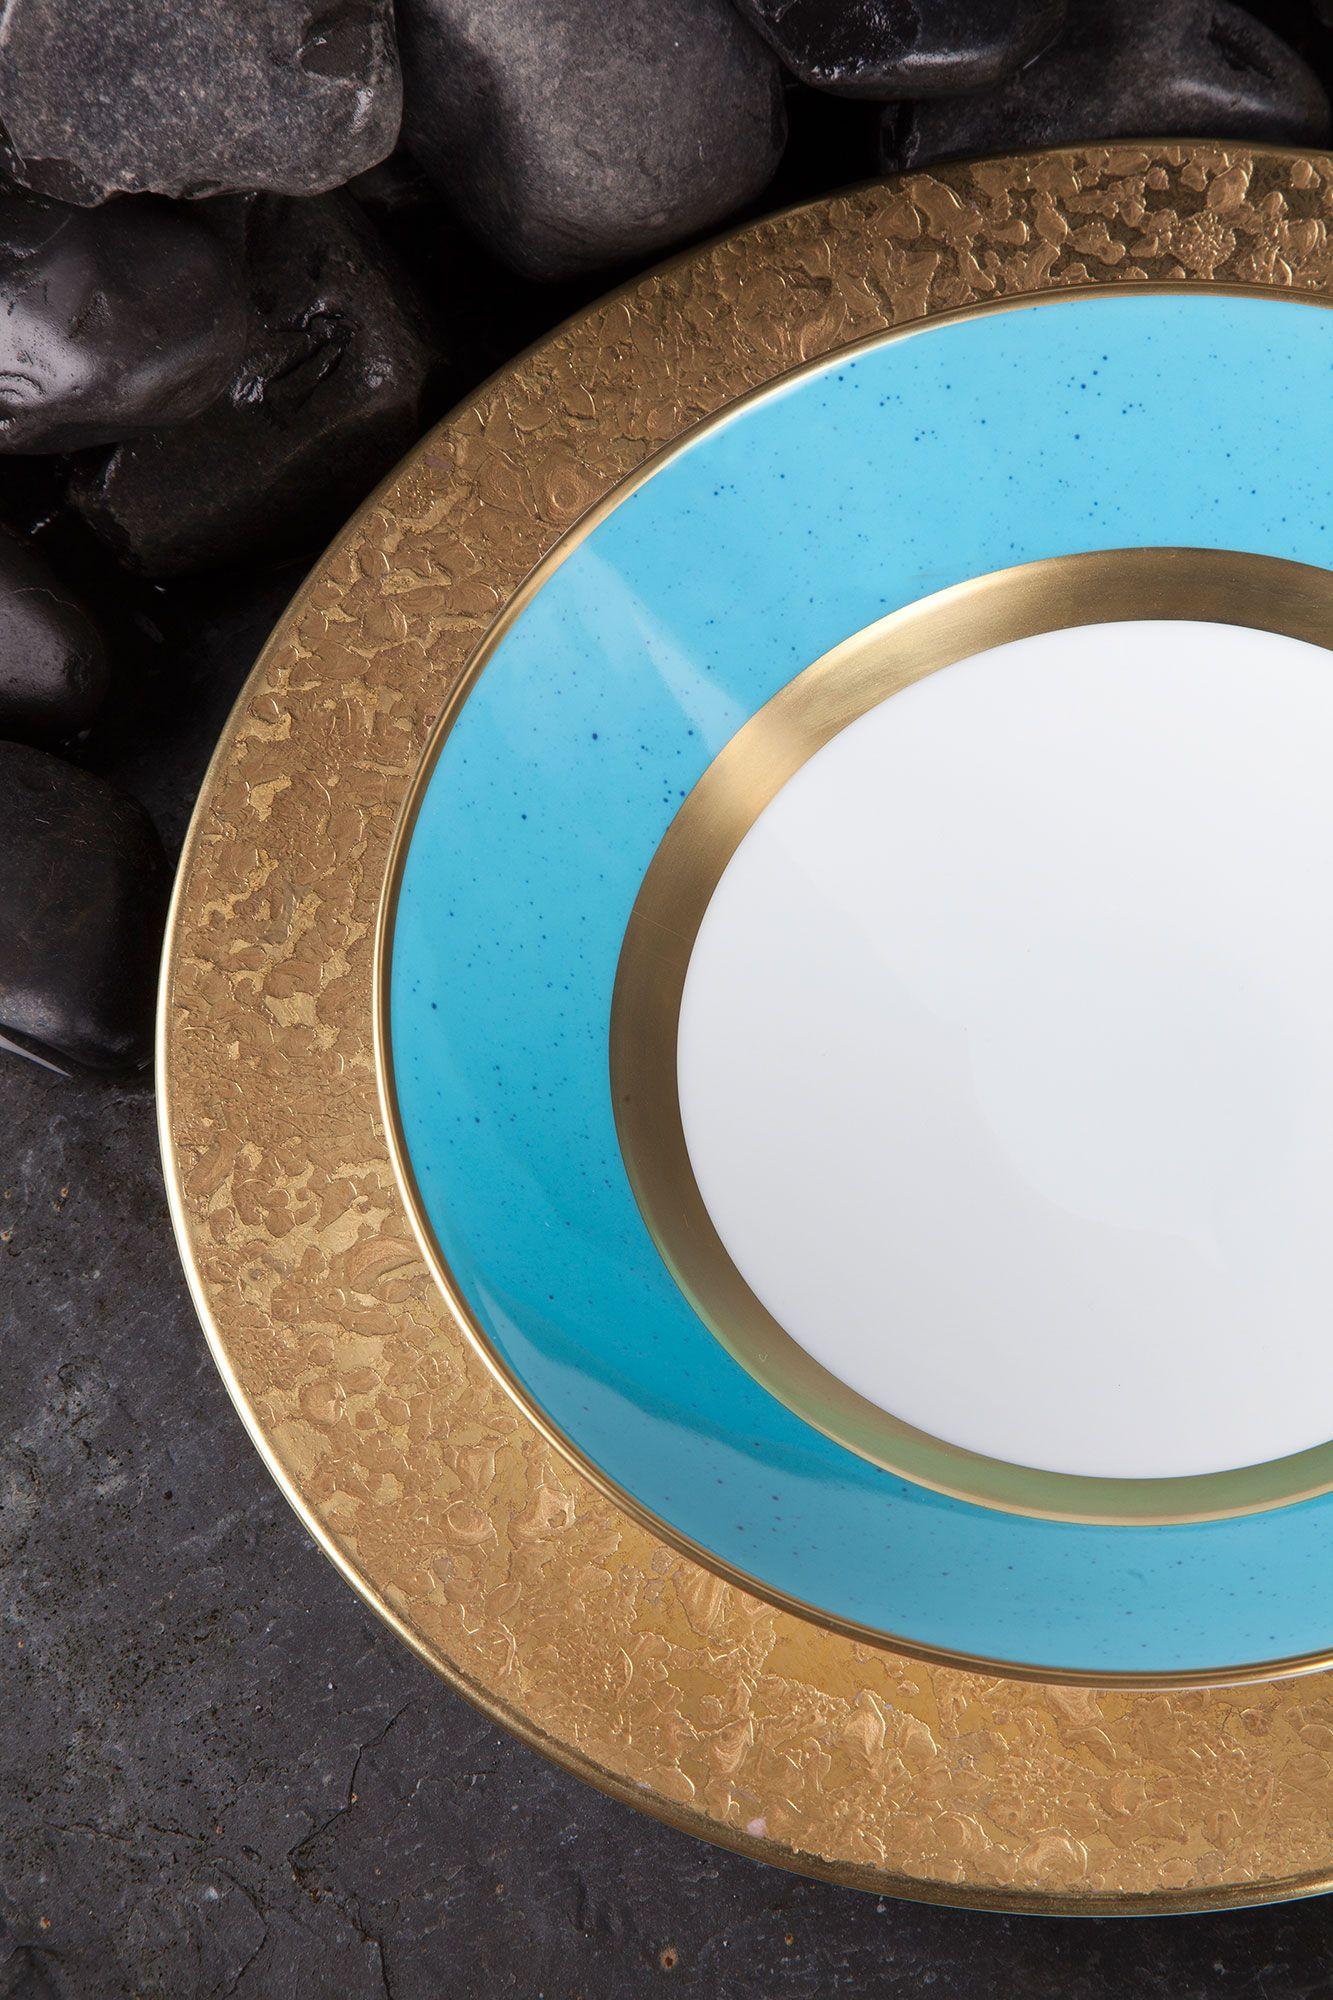 Legle Moonscape Gold Mineral Turquoise Porcelain Tableware Agentia Uk 食器